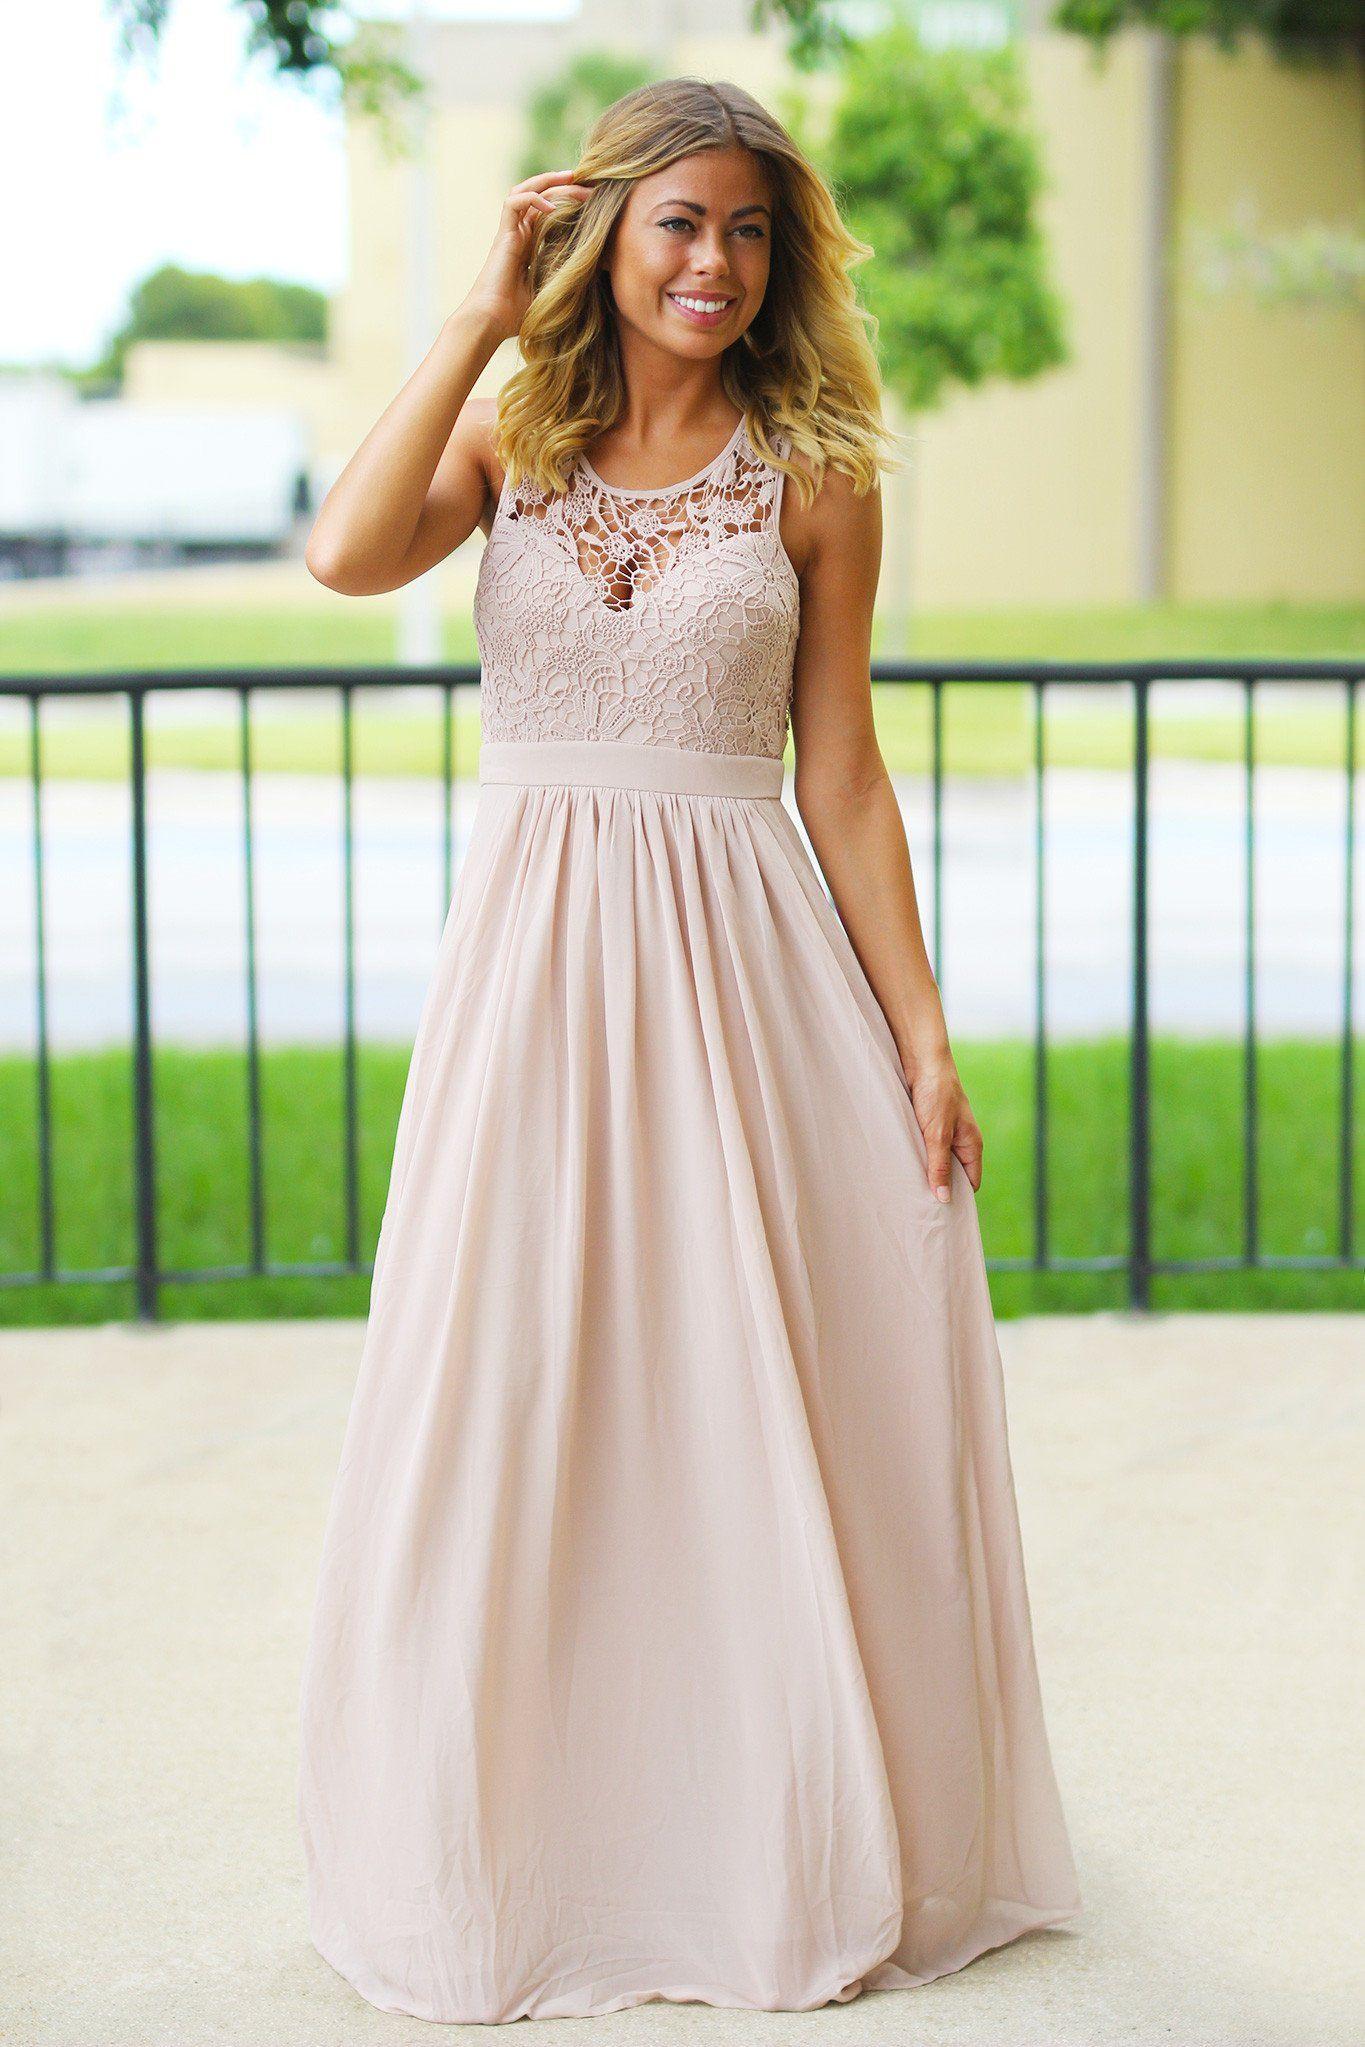 Tan Crochet Maxi Dress With Open Back Crochet Maxi Dress Dresses Maxi Dress [ 2047 x 1365 Pixel ]